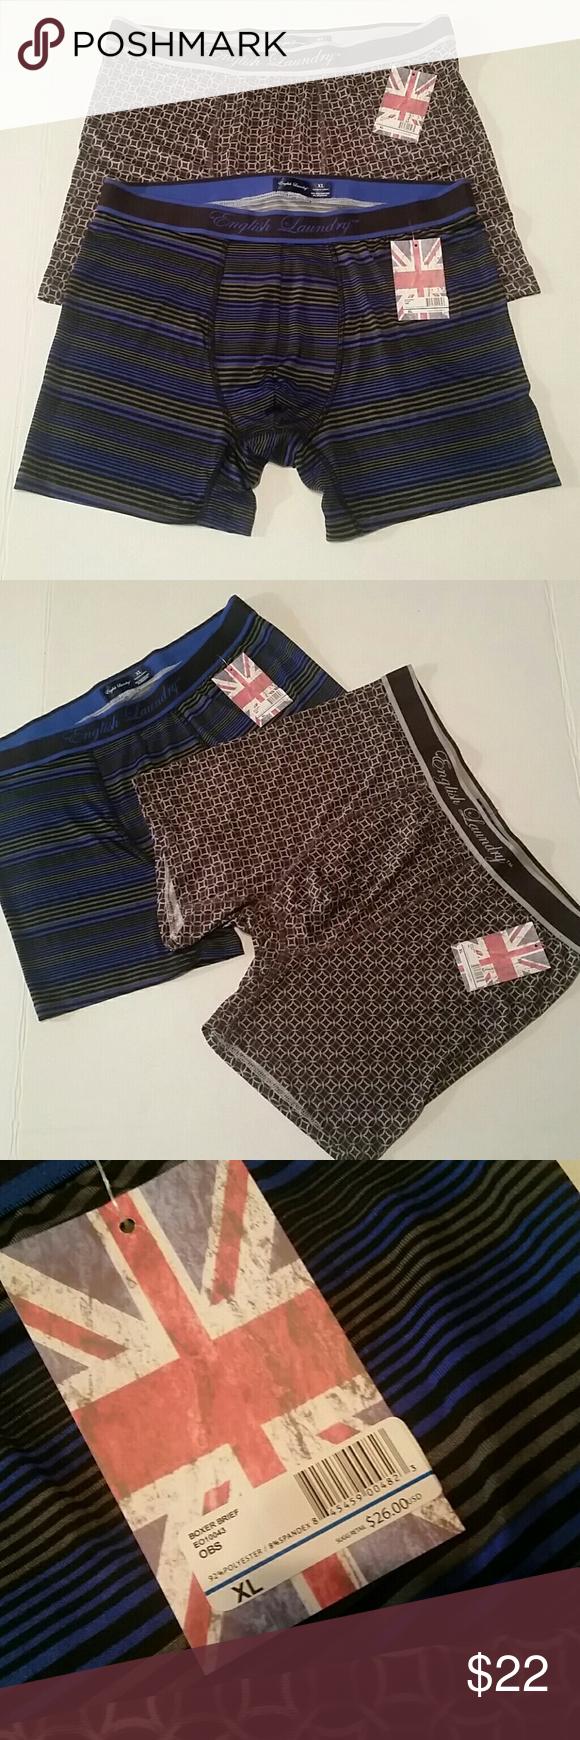 English Laundry Men S Boxer Briefs Size Xl Nwt English Laundry